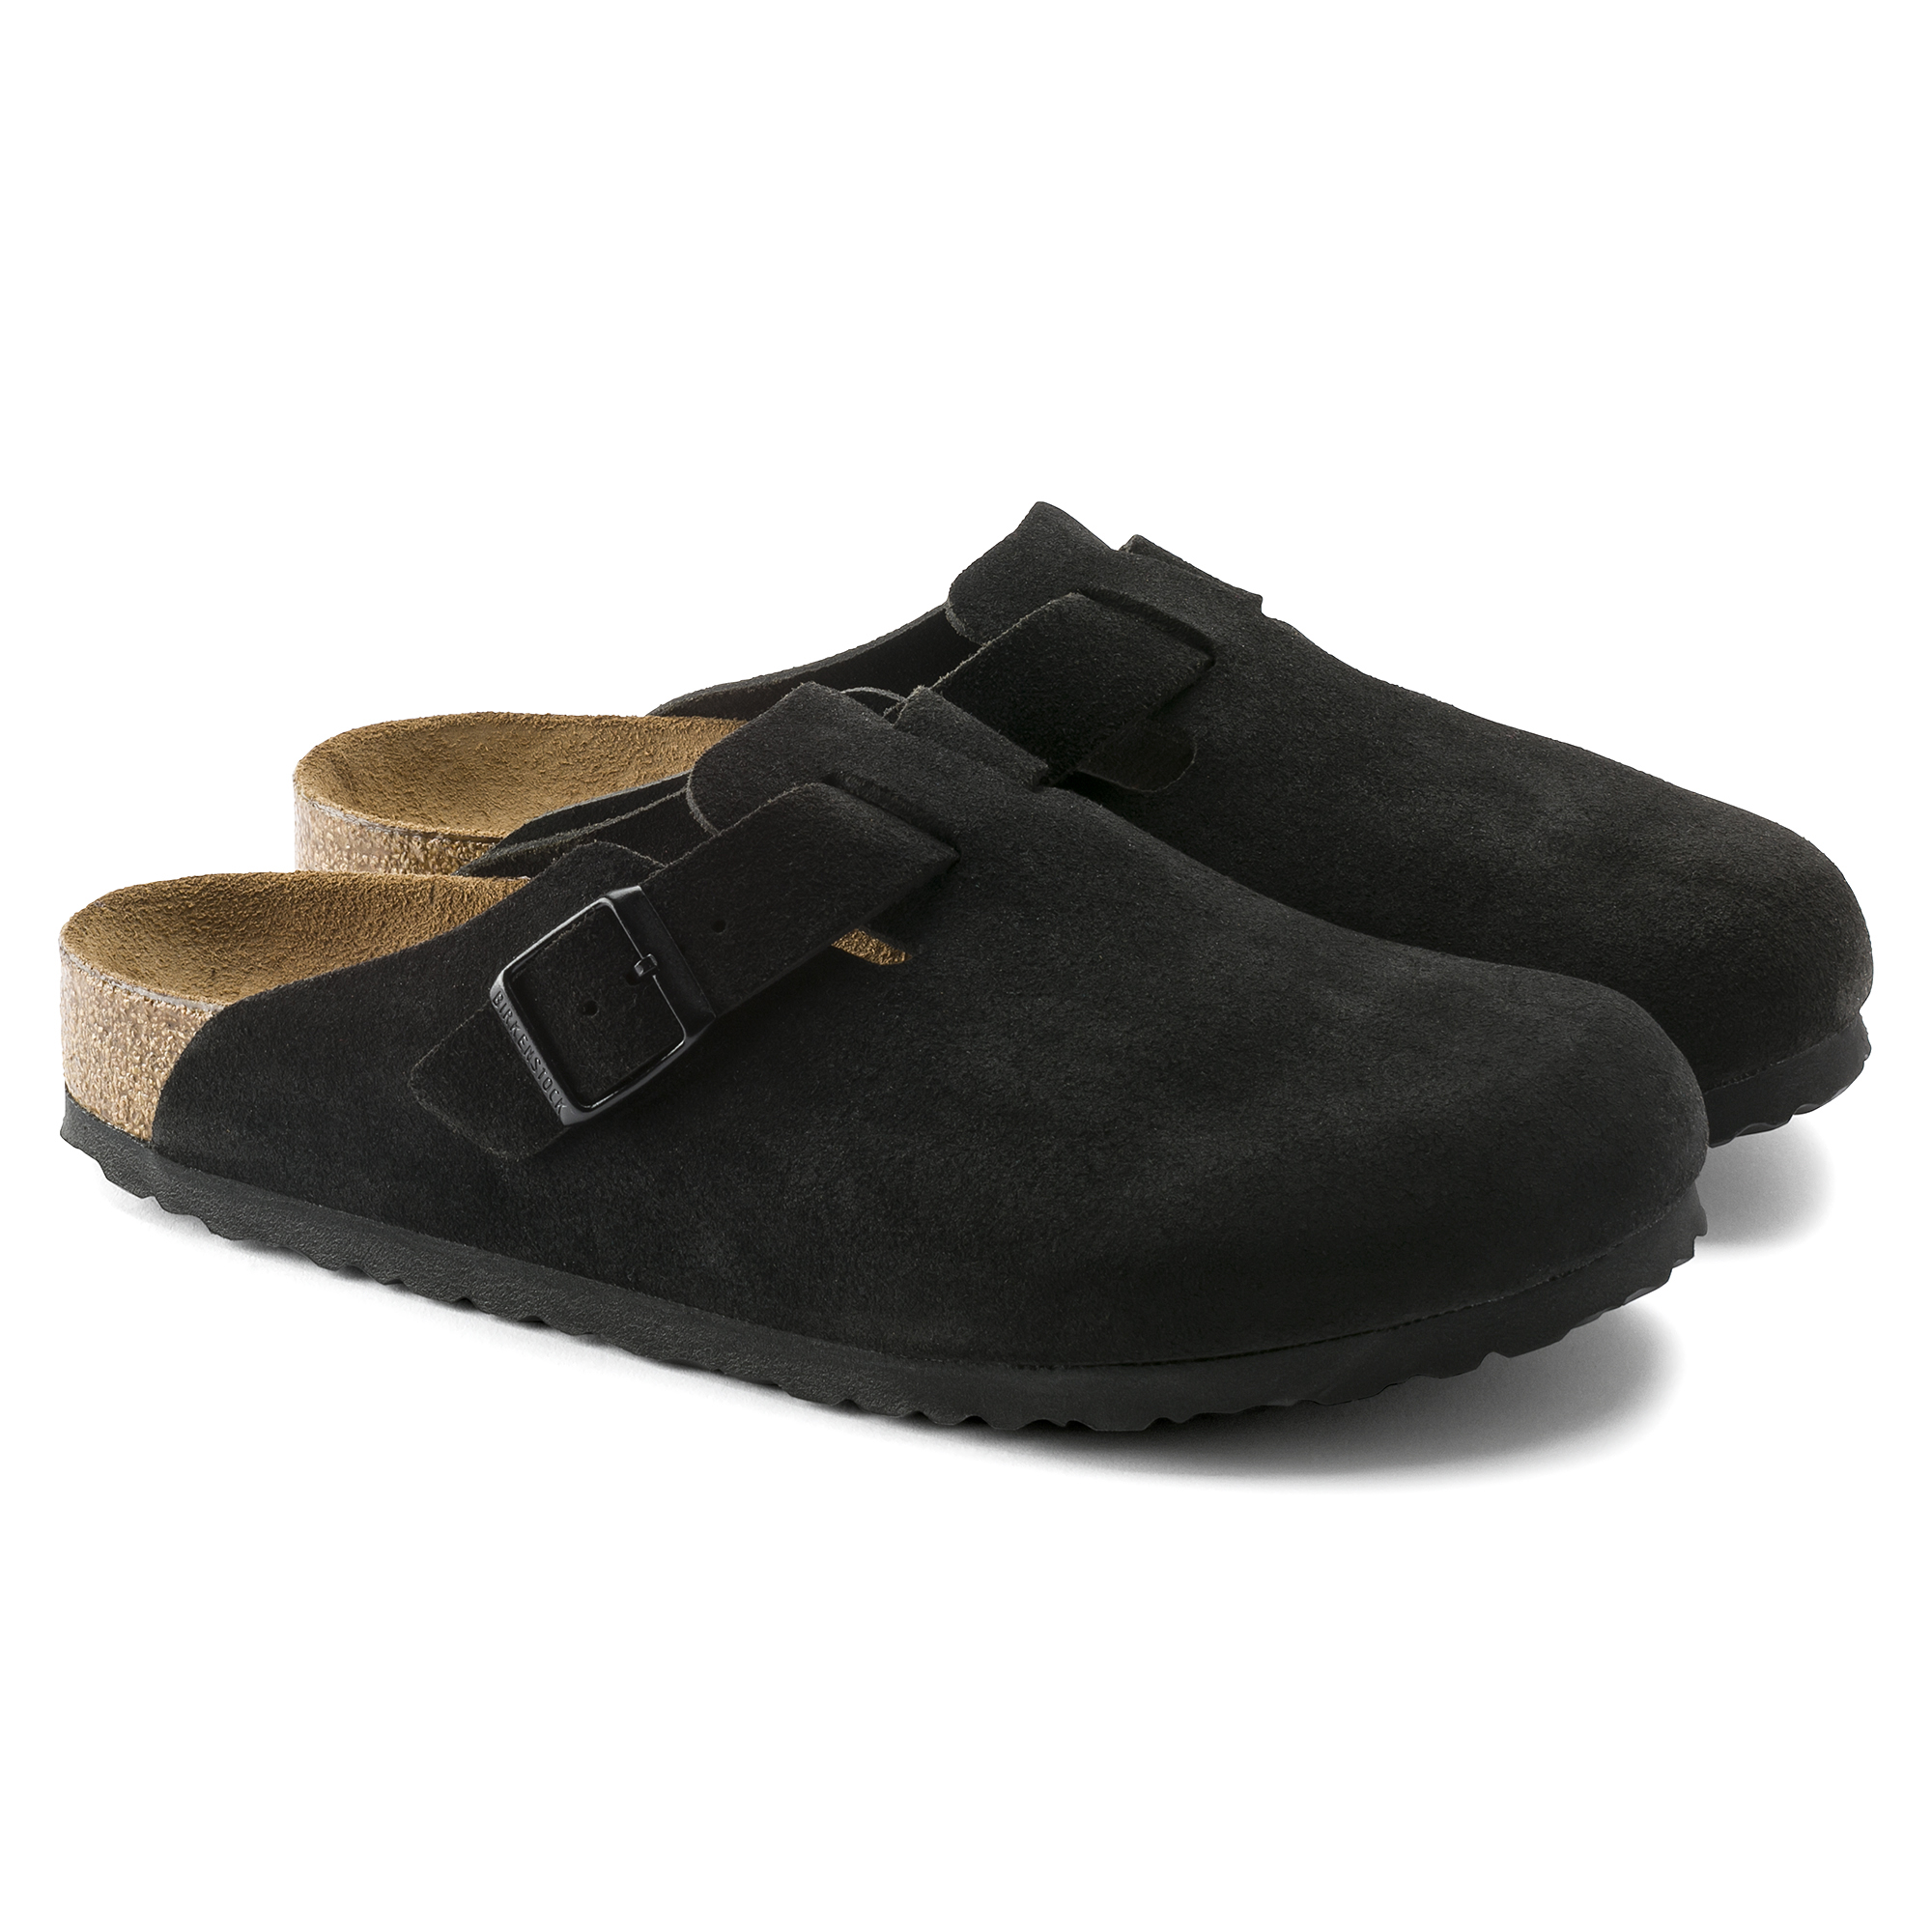 8b44fea36f64b Boston Suede Leather | shop online at BIRKENSTOCK